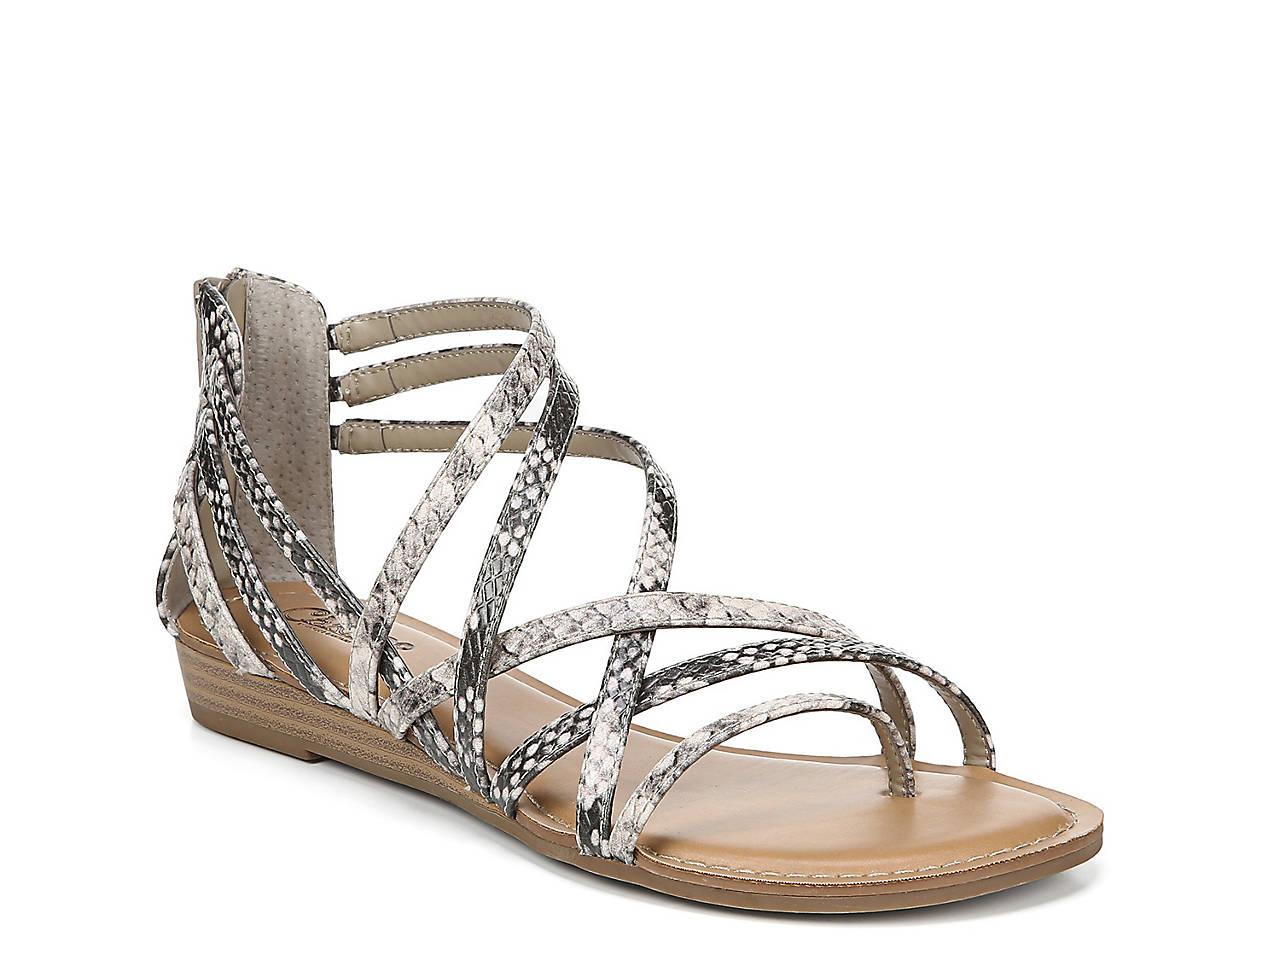 23fd590ae611 Carlos by Carlos Santana Amara Gladiator Wedge Sandal Women s Shoes ...